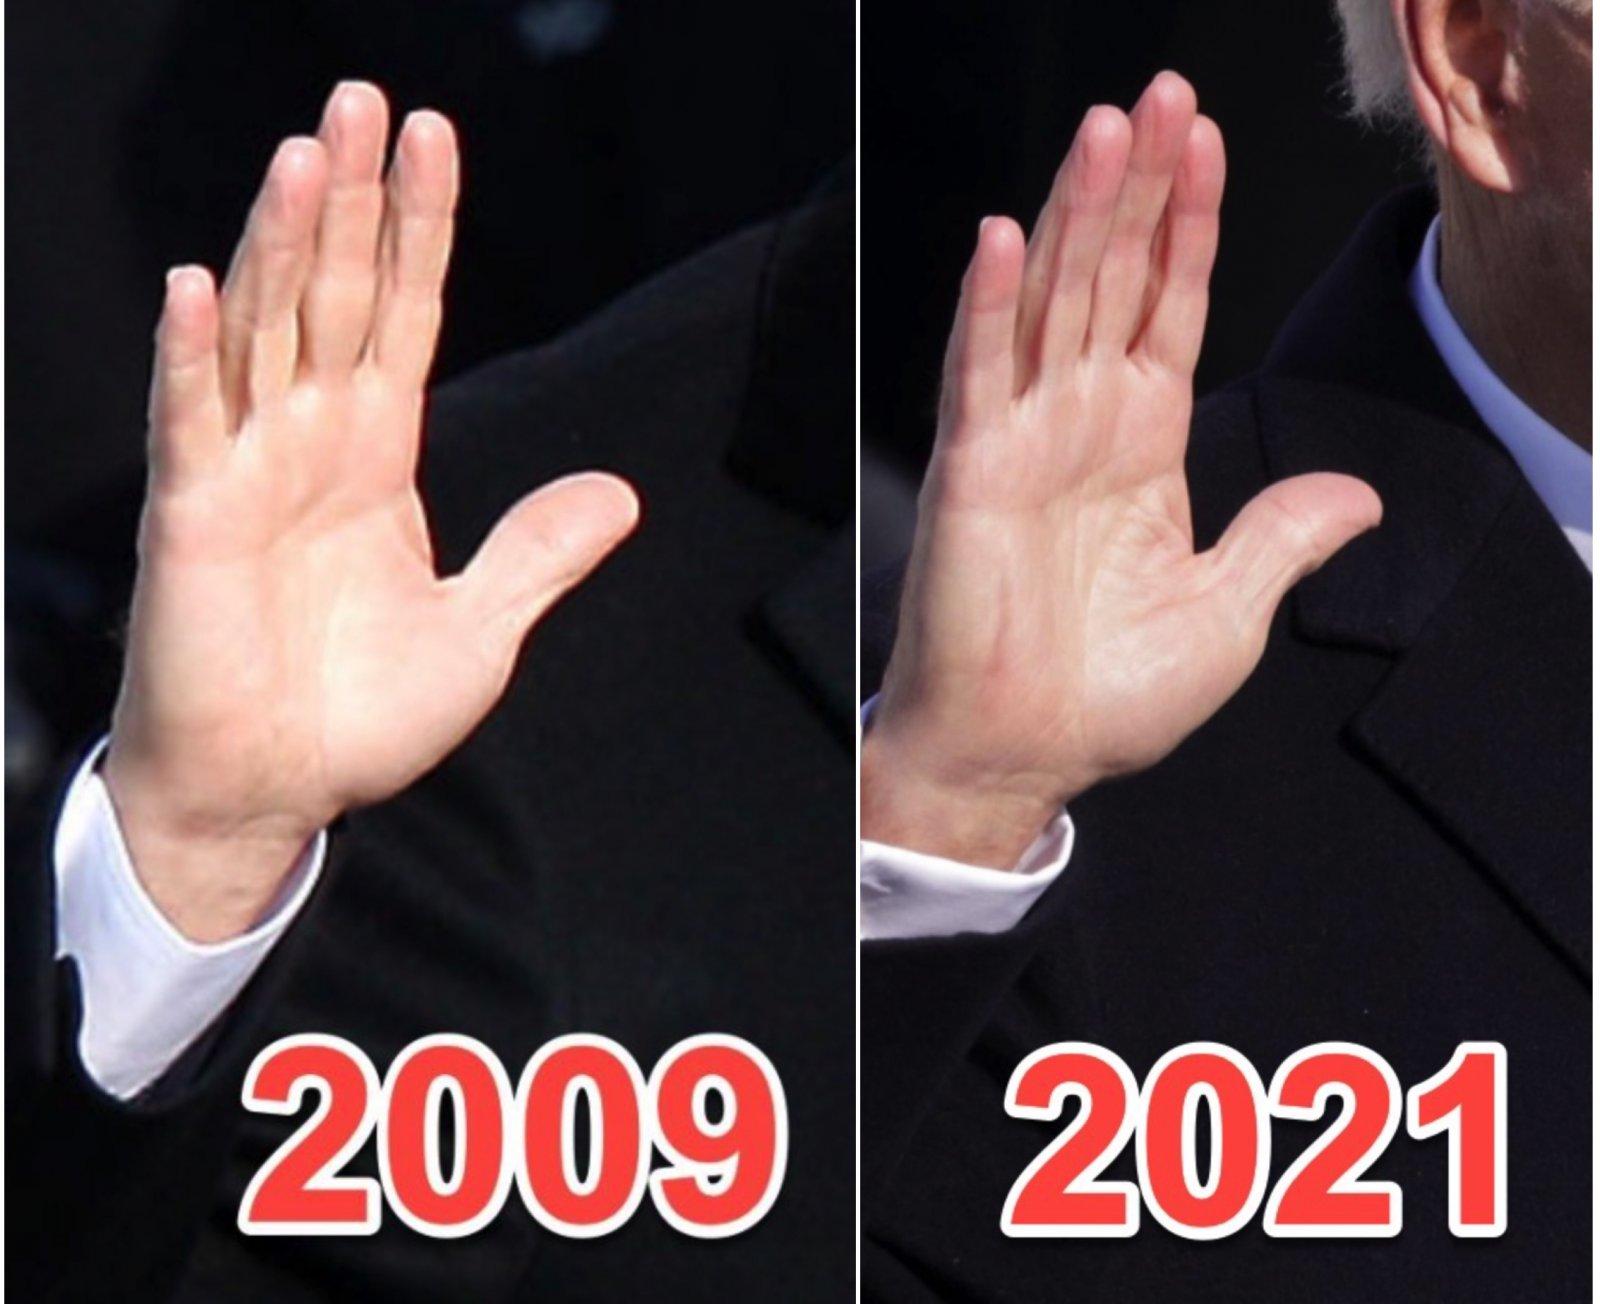 Biden's hand.jpg